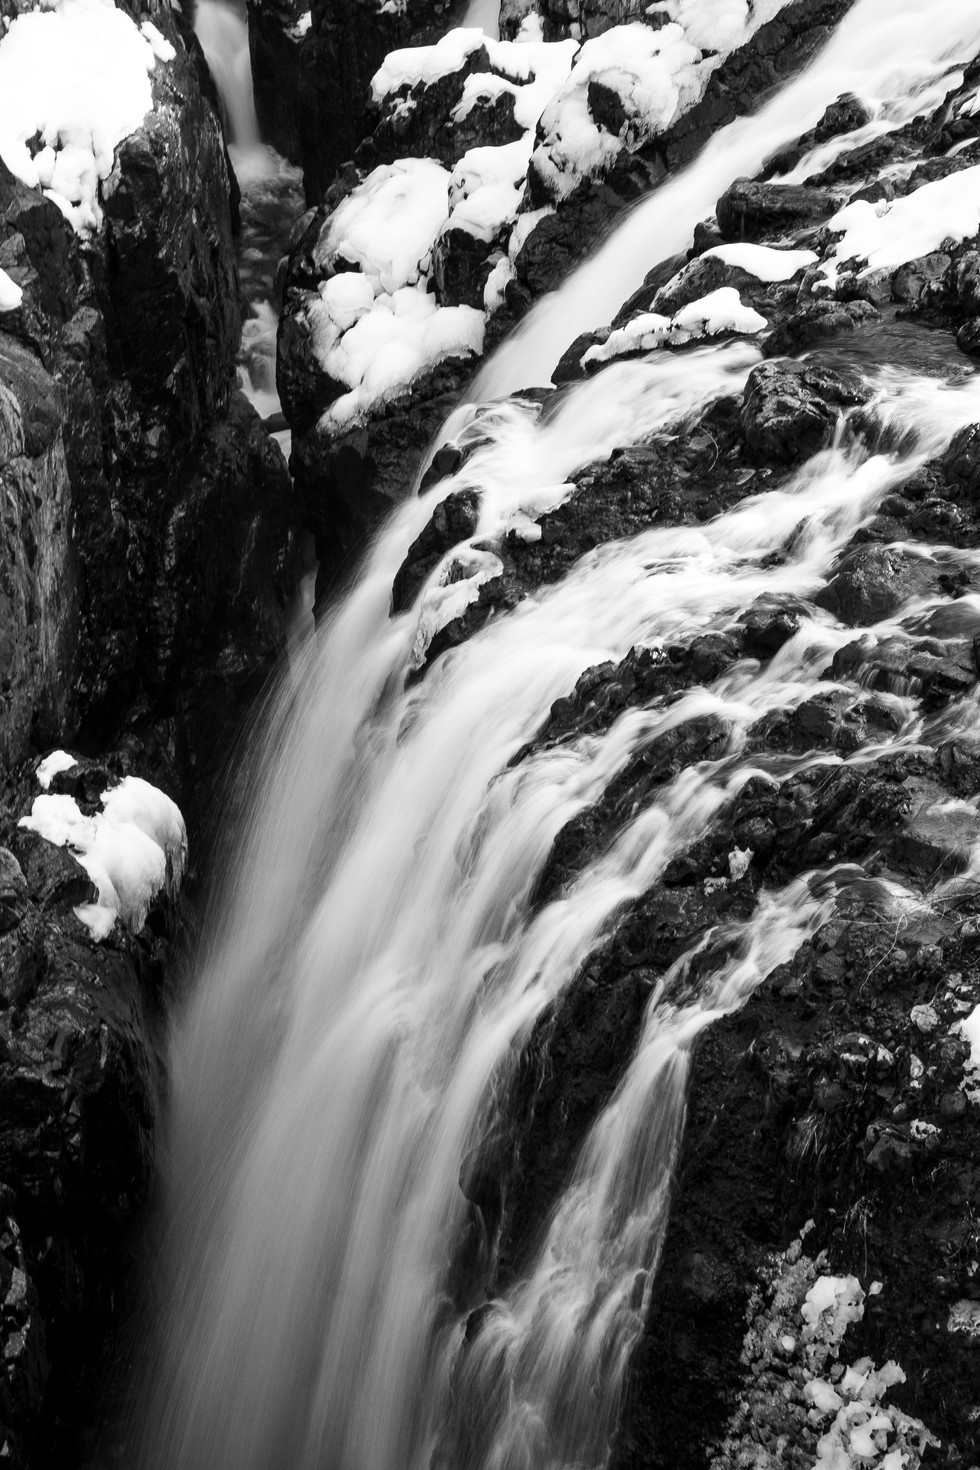 black and white englishman river falls.j